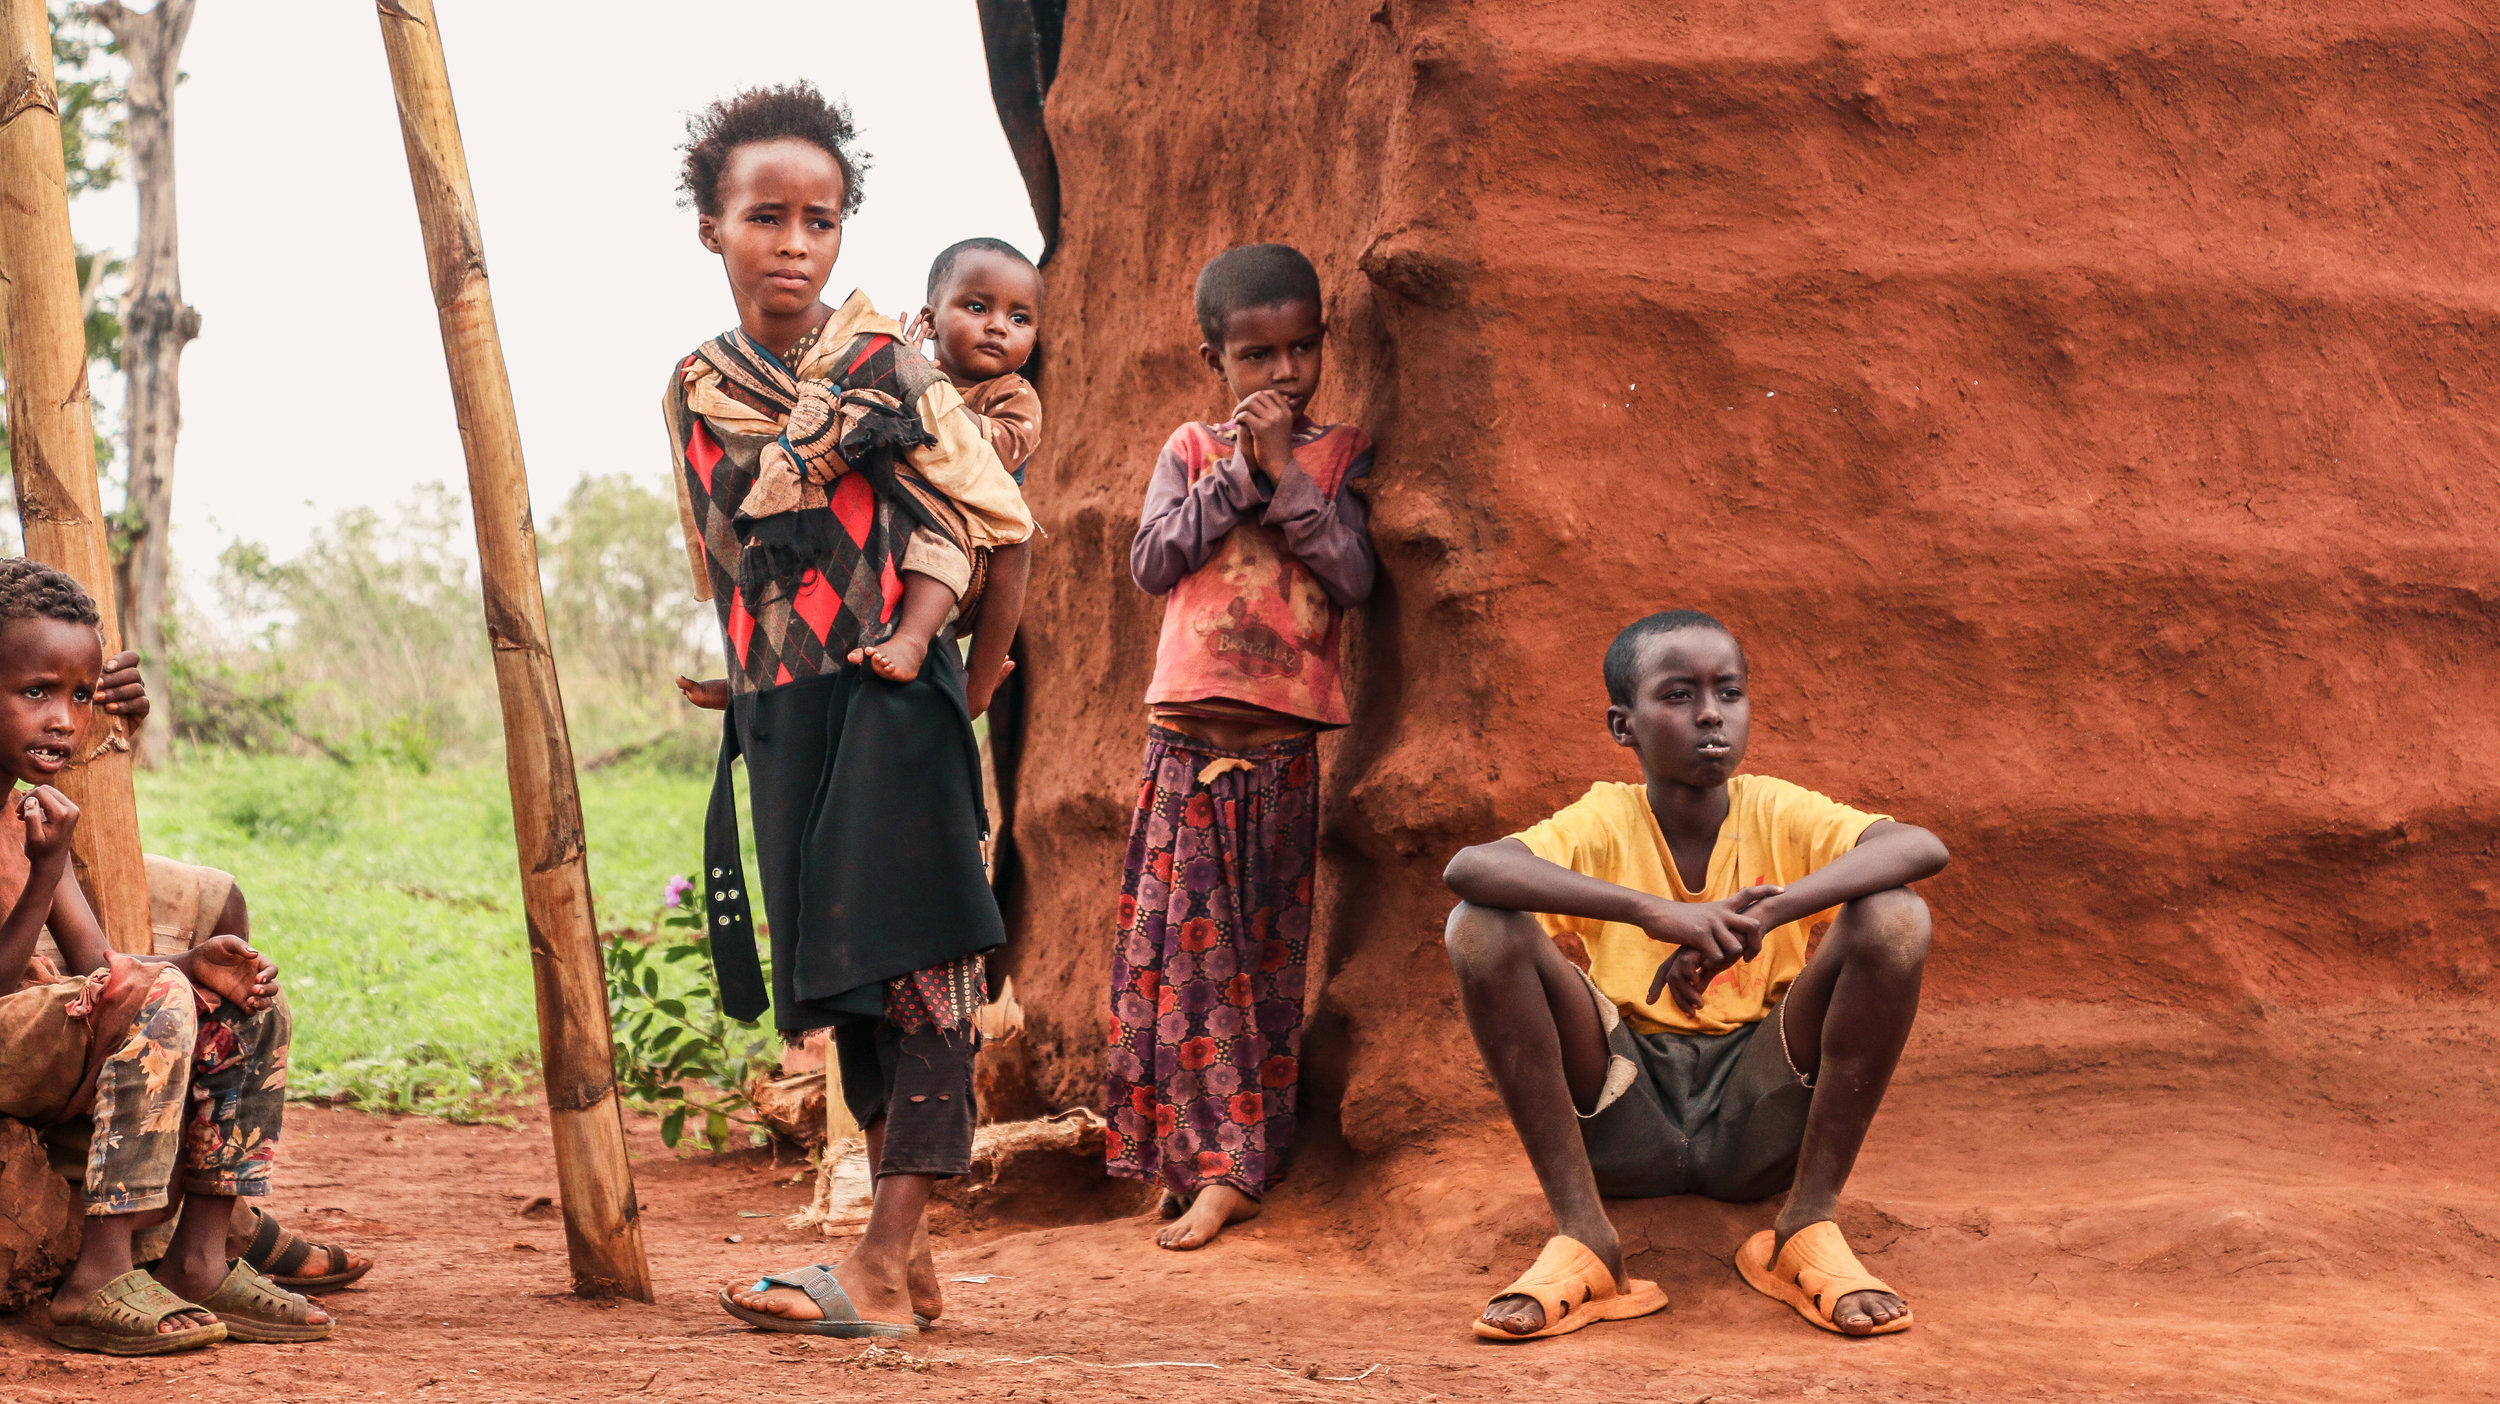 Africa2017-50.jpg